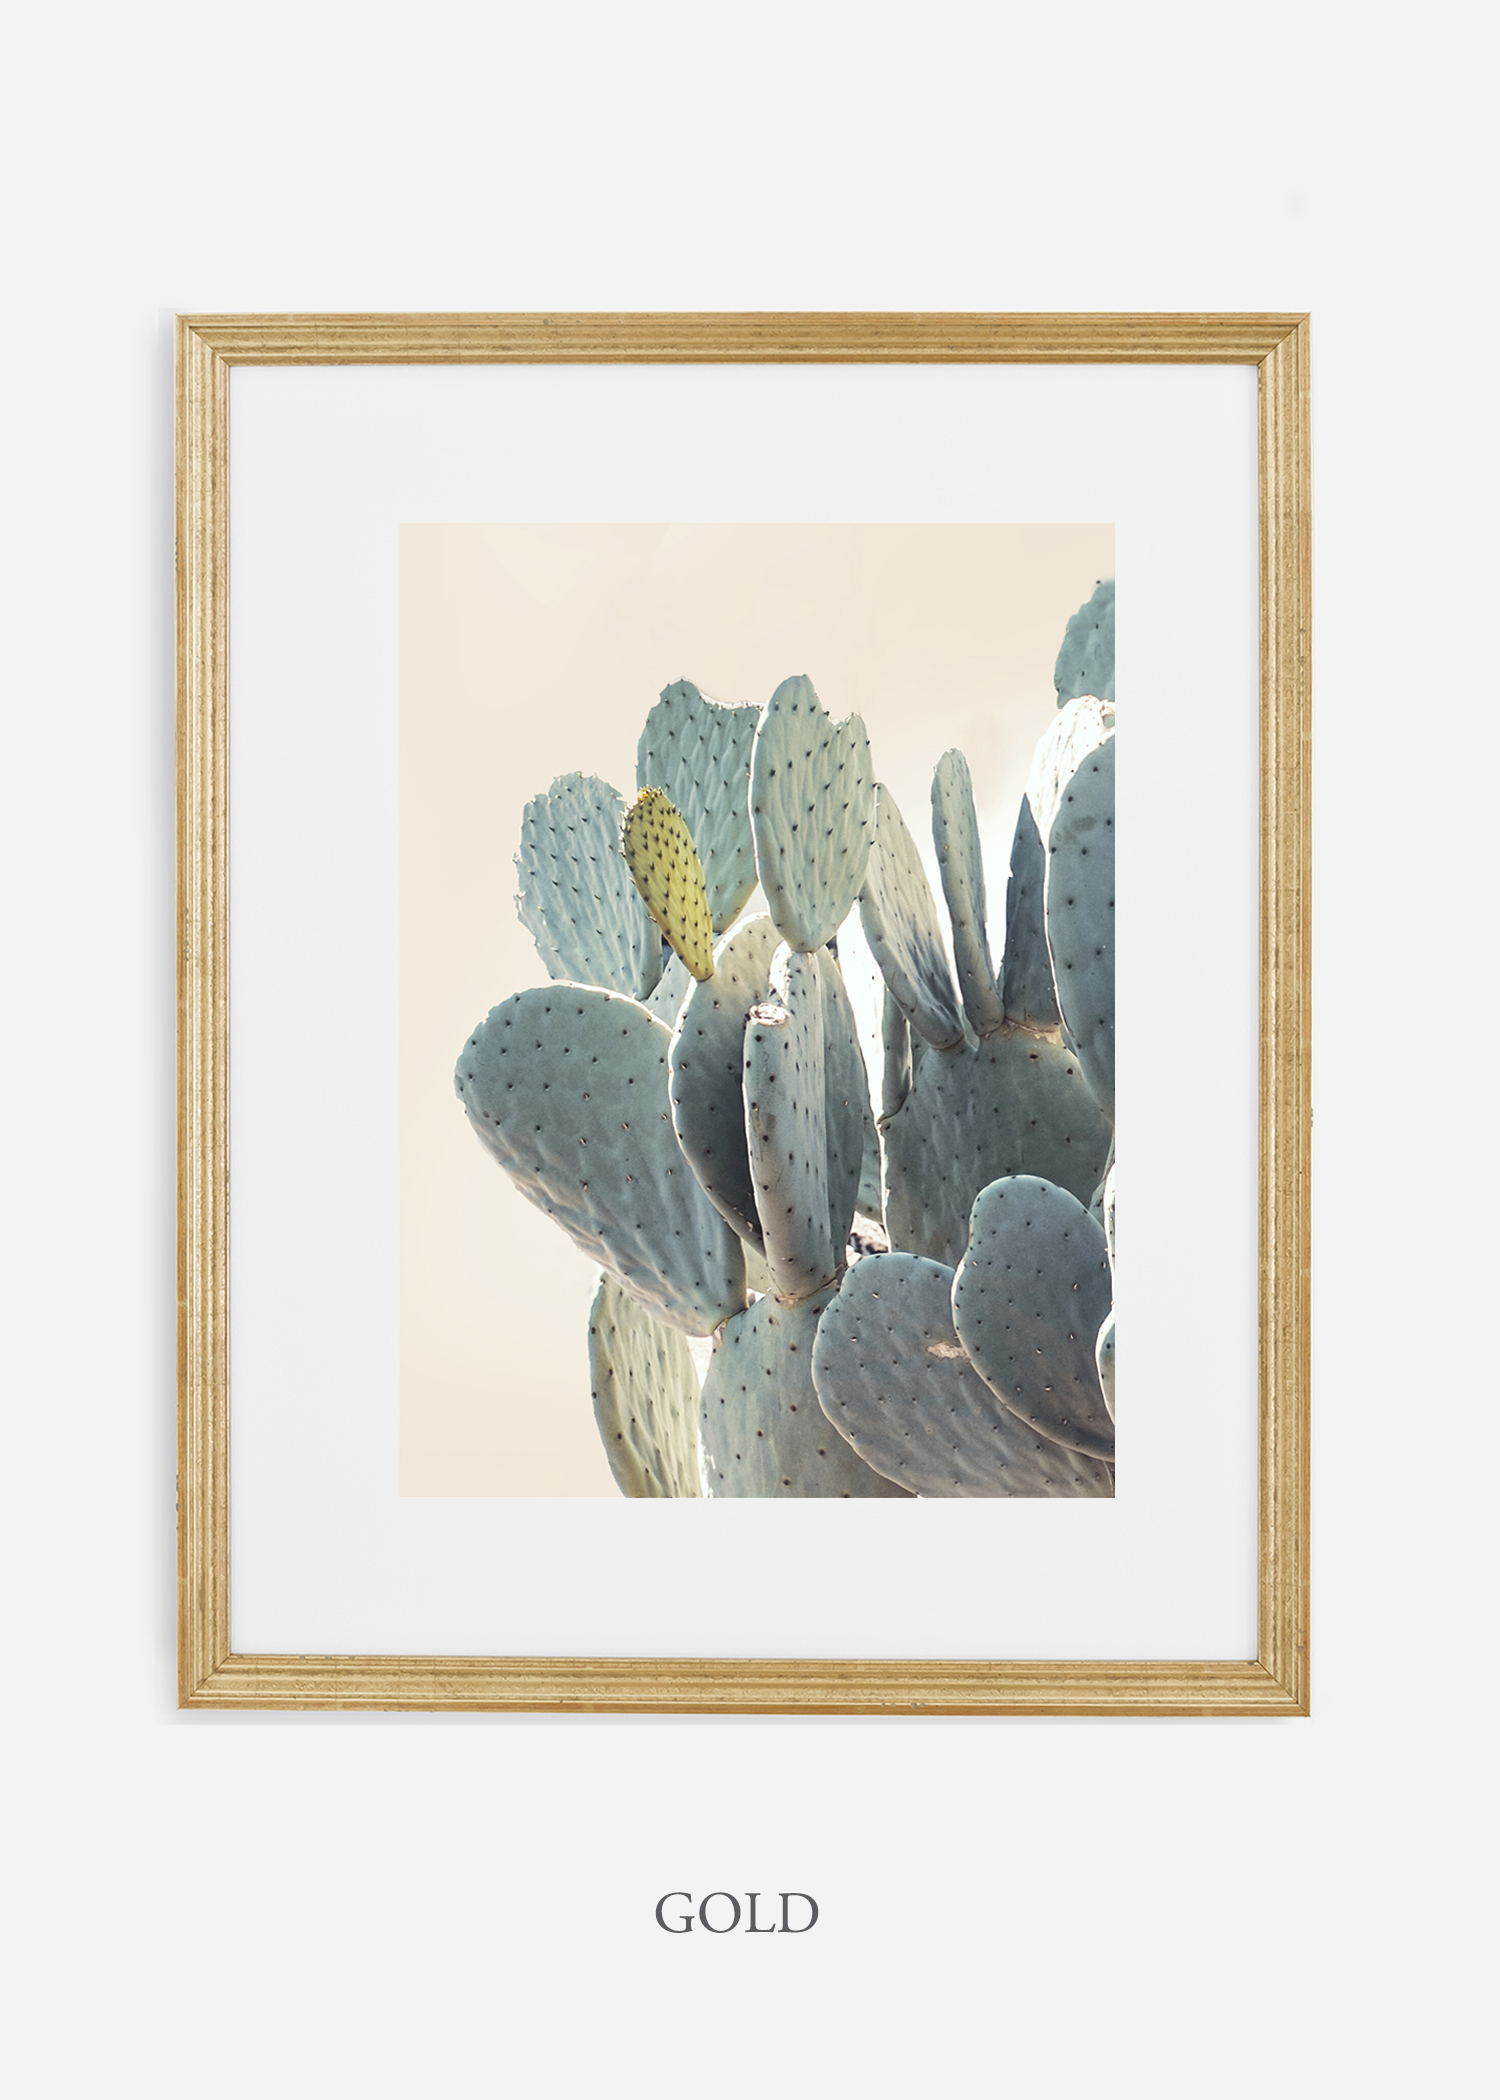 Desert_goldframe_DesertDetails_Cactus__Art_Photography_interiordesign_bohemian_cactusart.jpg